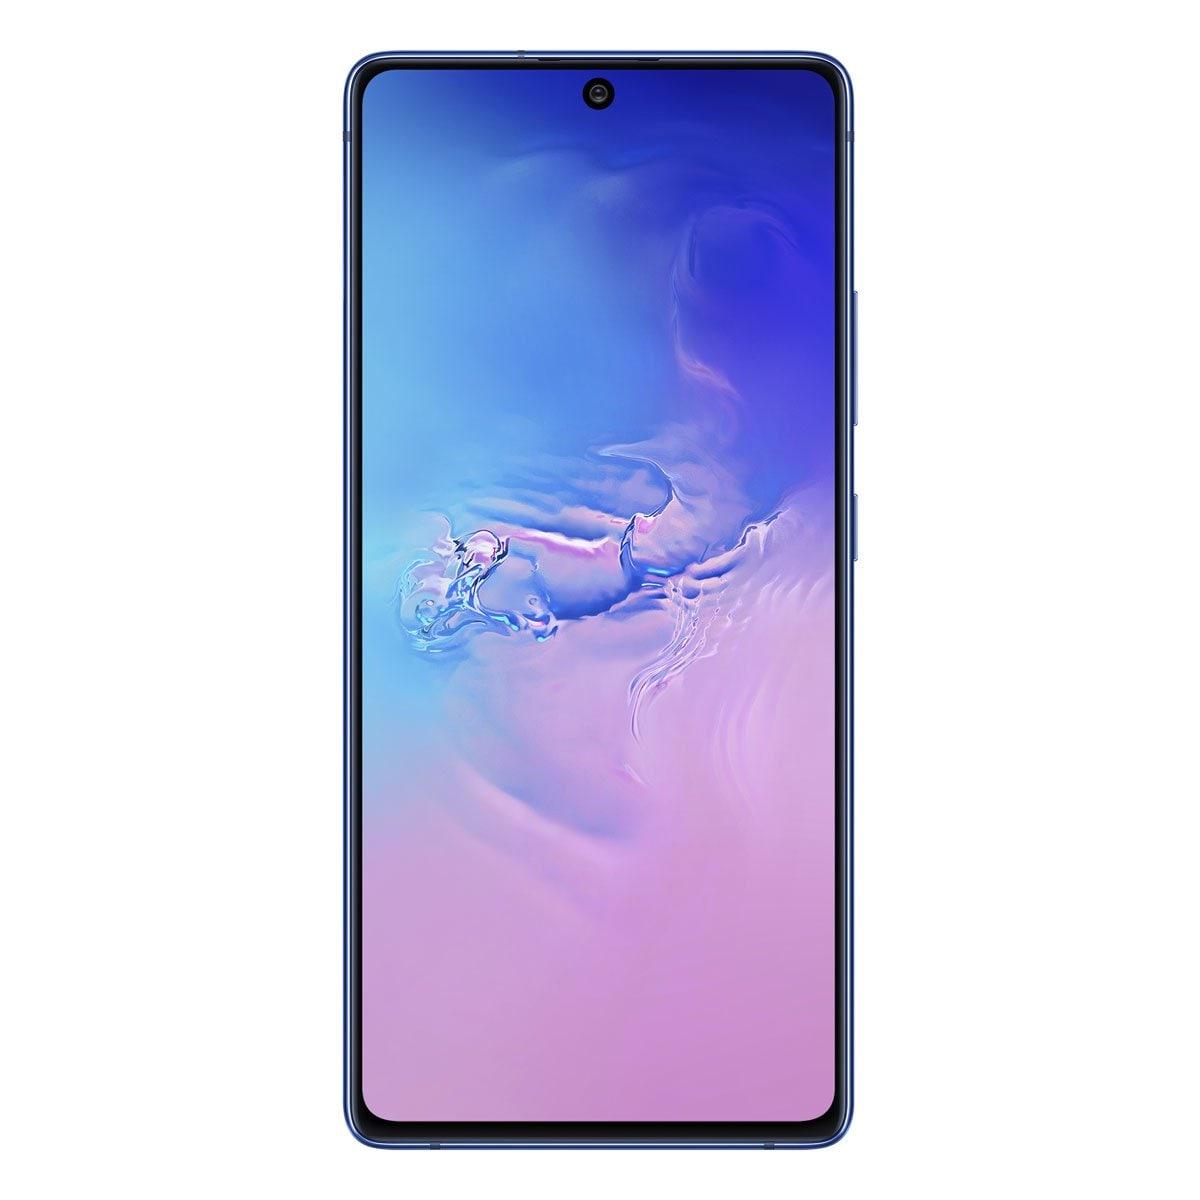 Celular Samsung Galaxy S10 Lite G770 Color Azul R9 (Telcel)